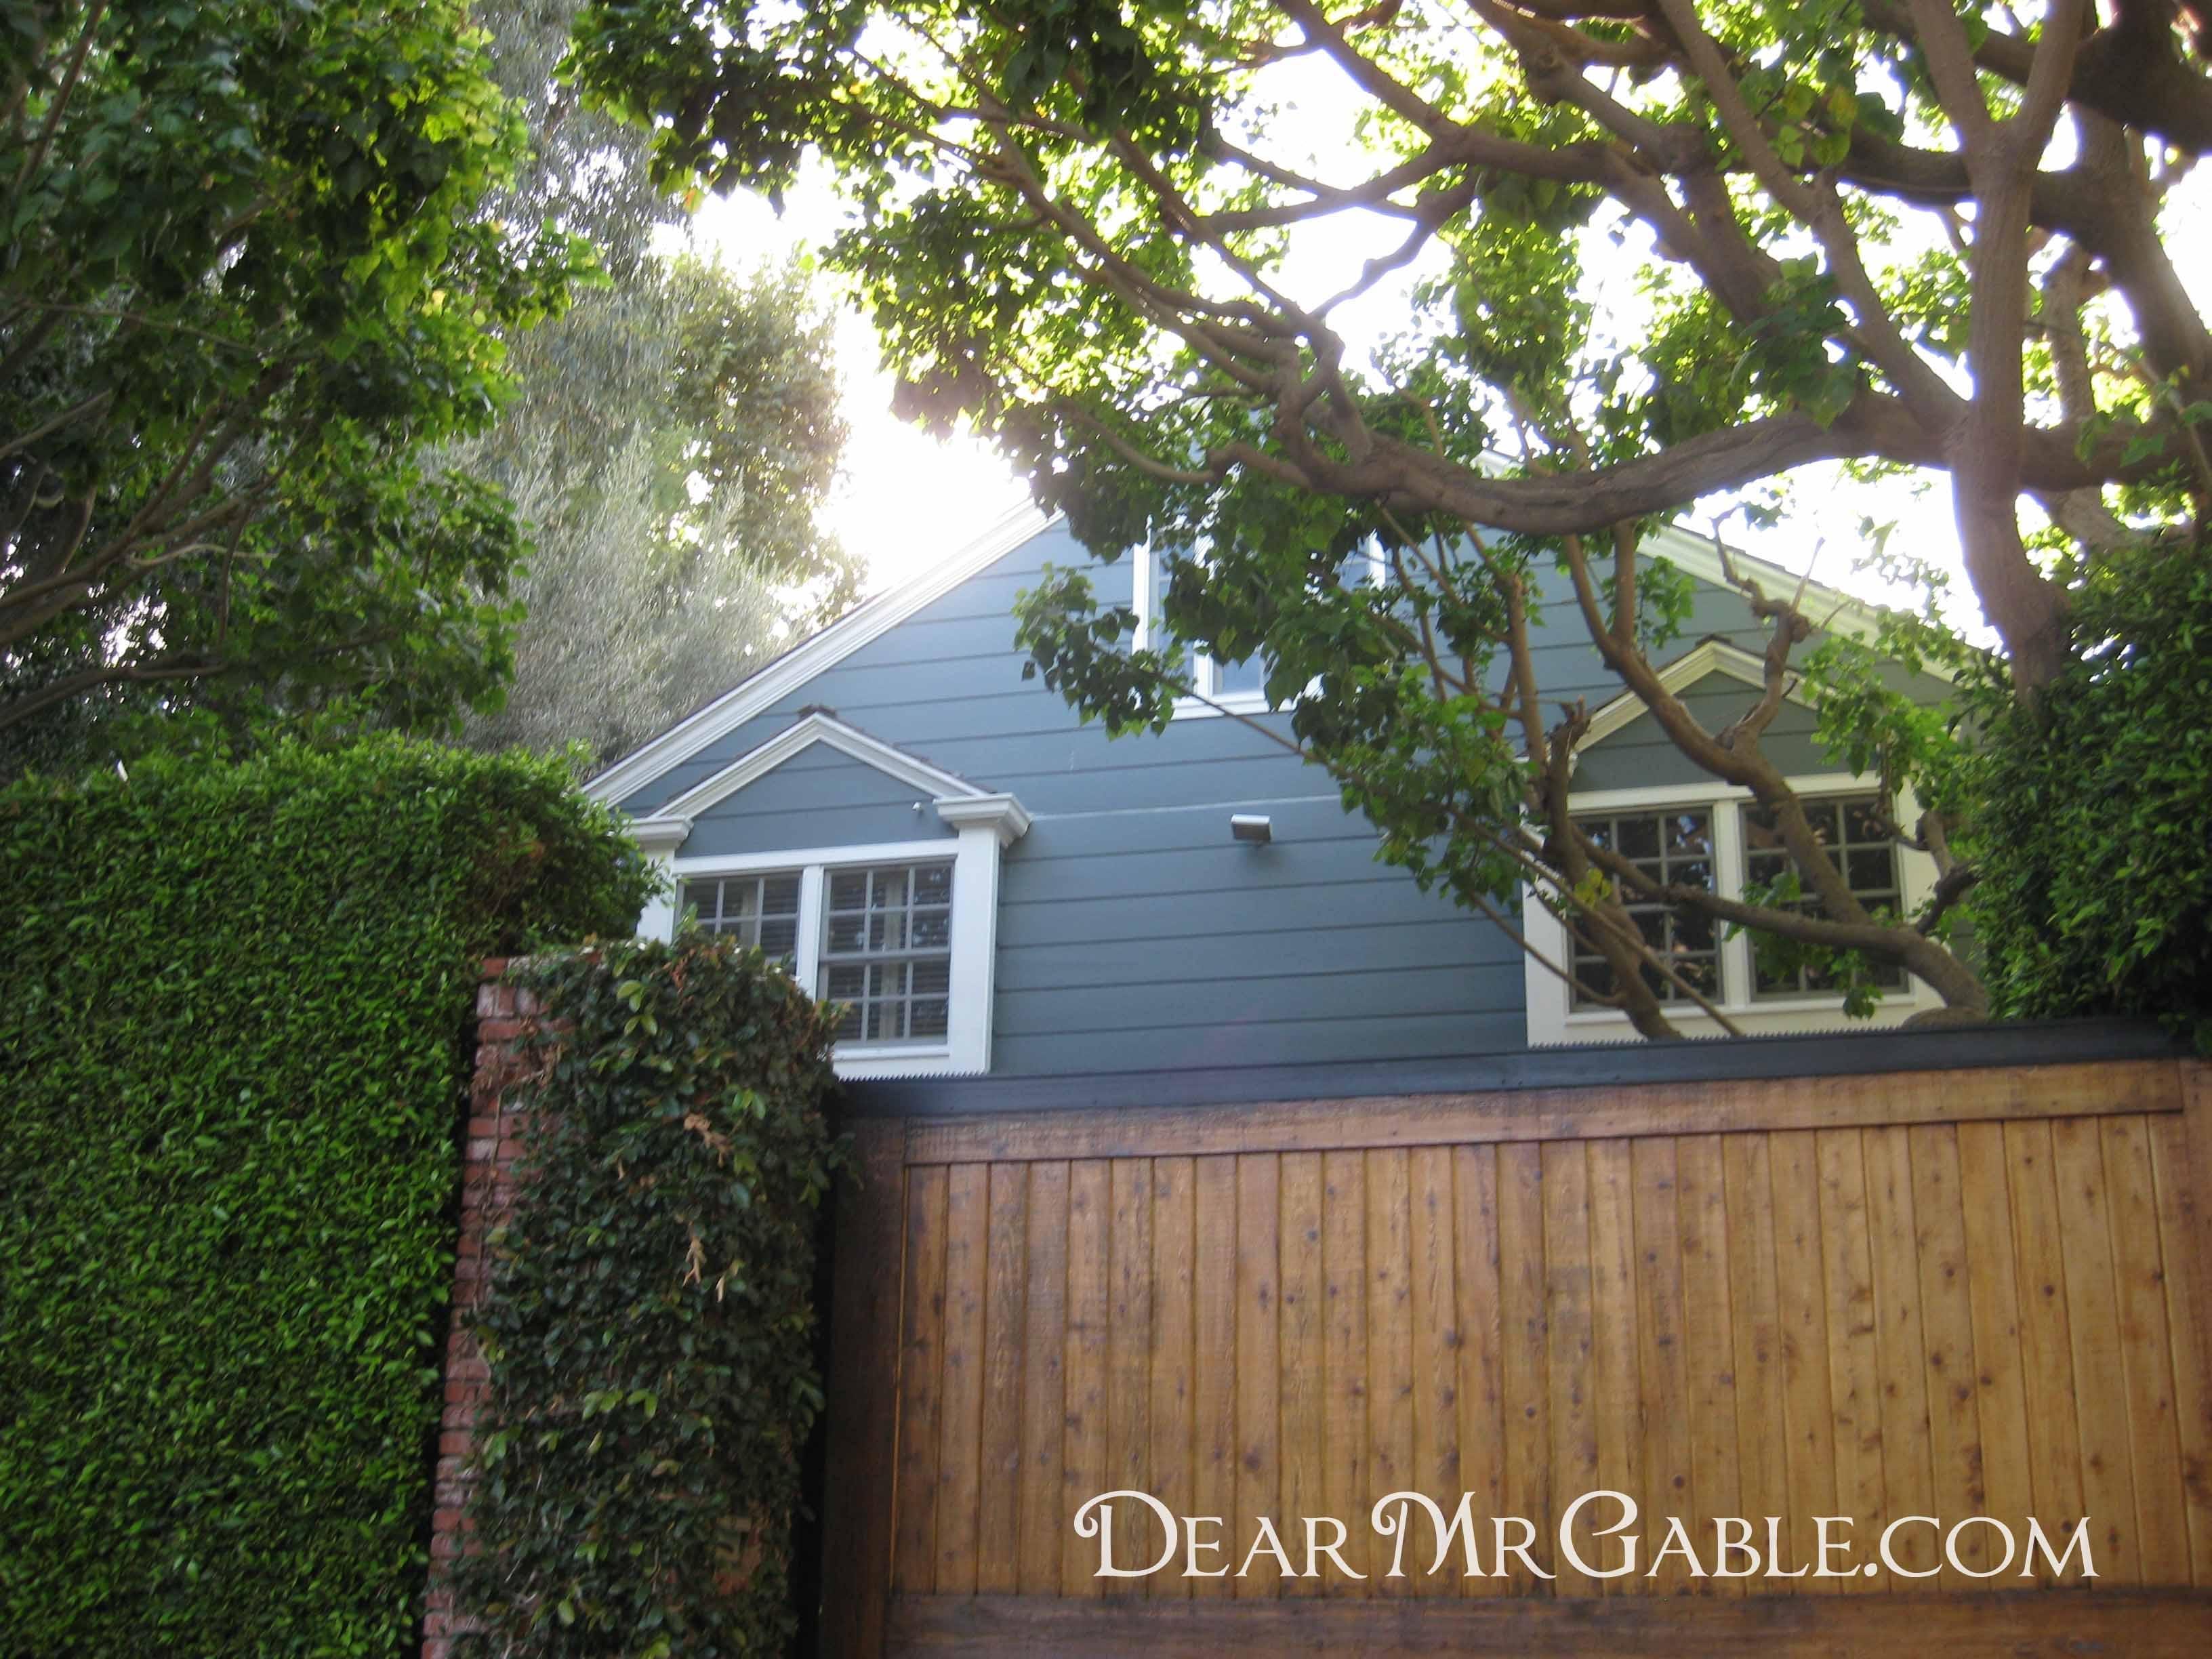 hollywood} home to encino – dear mr. gable